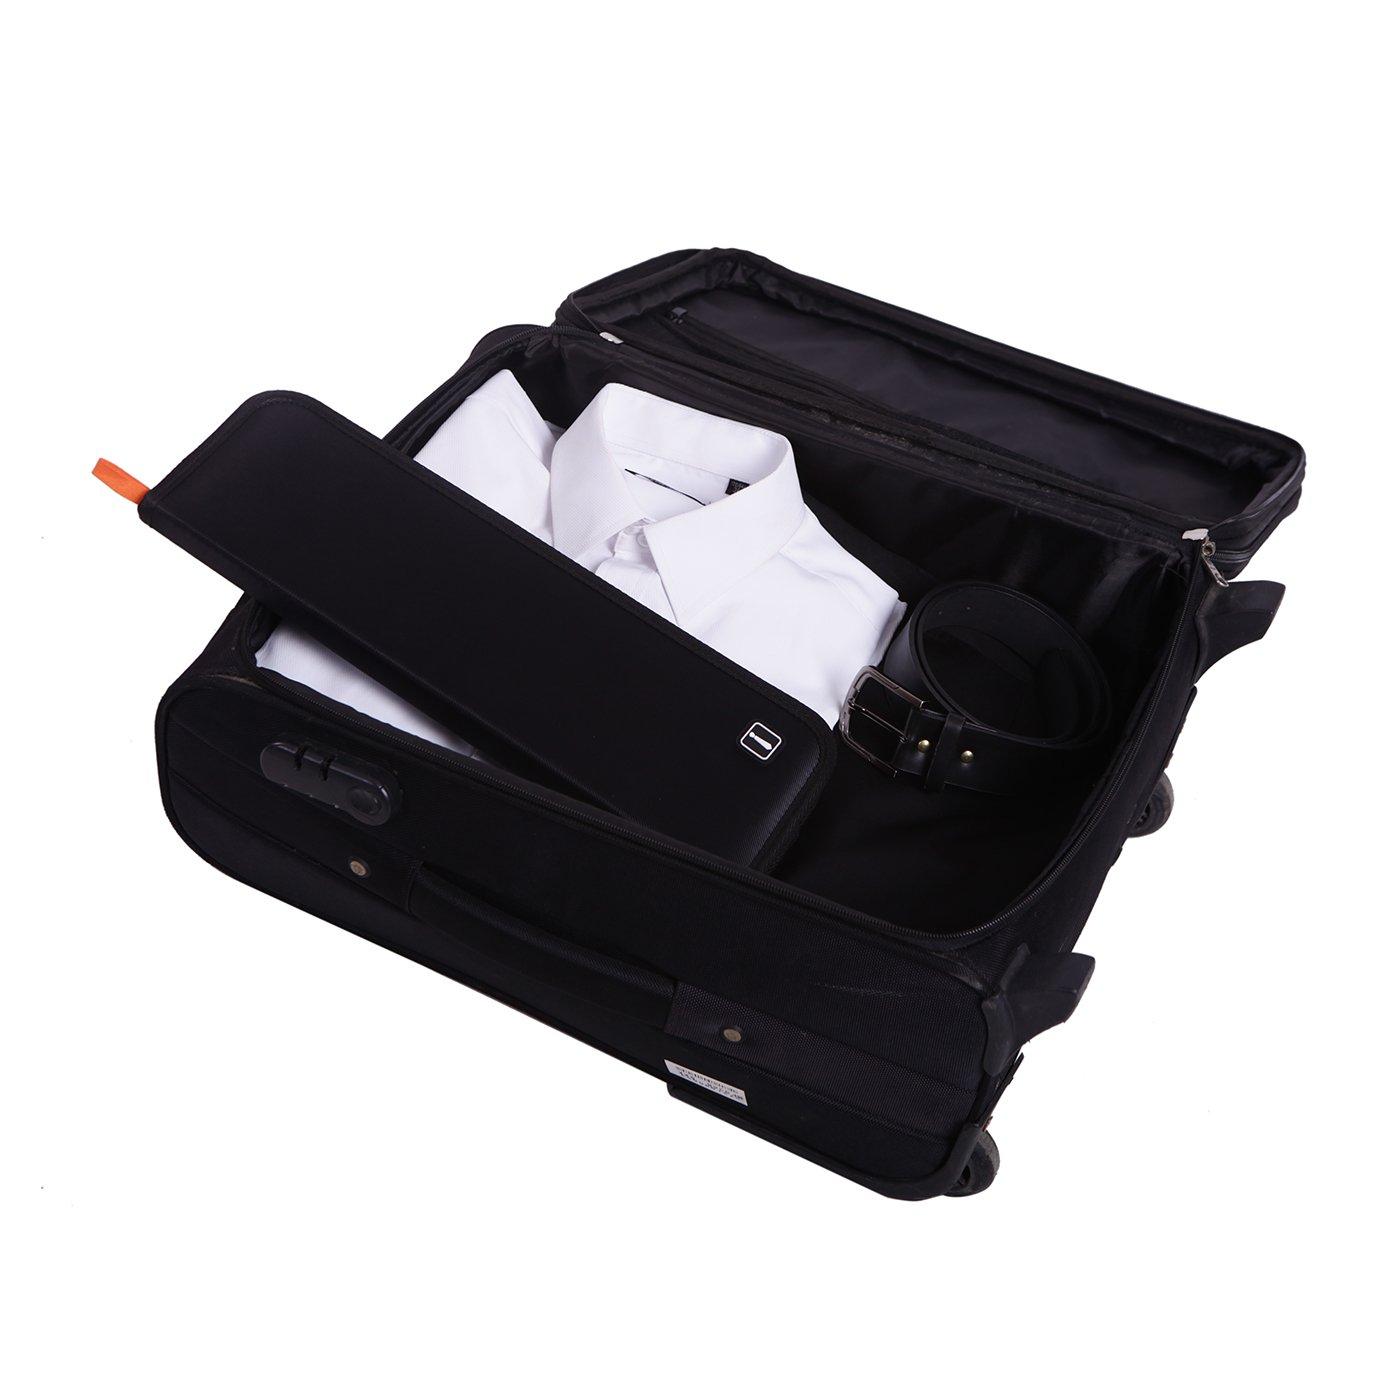 HDE Travel Tie Case Necktie Luggage Organizer Portable Nylon Storage Bag by HDE (Image #4)